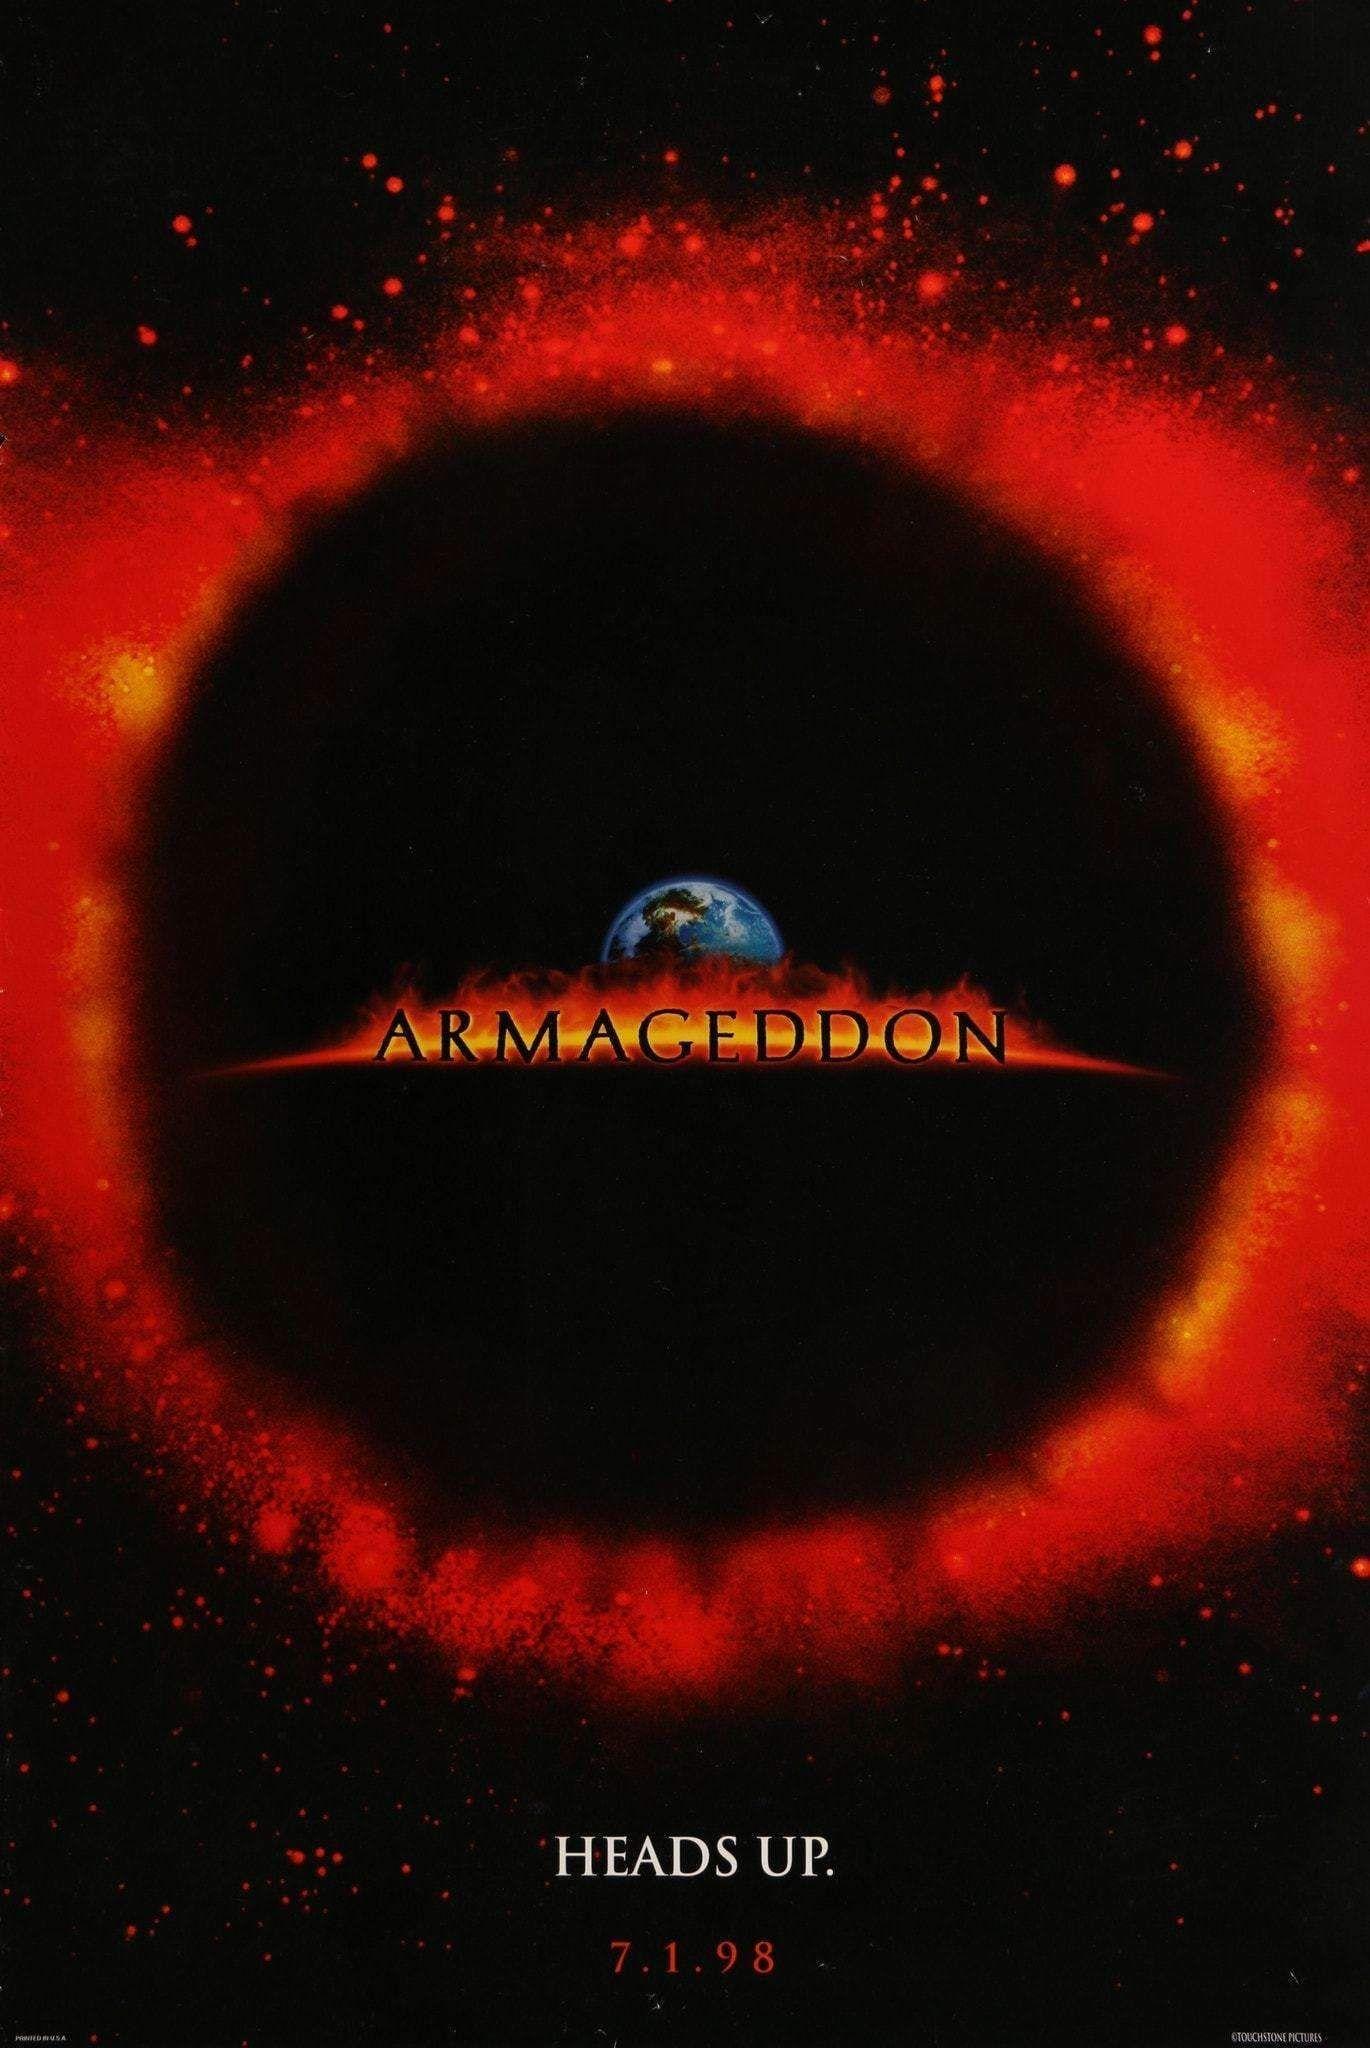 Armageddon (1998) Armageddon movie, Streaming movies